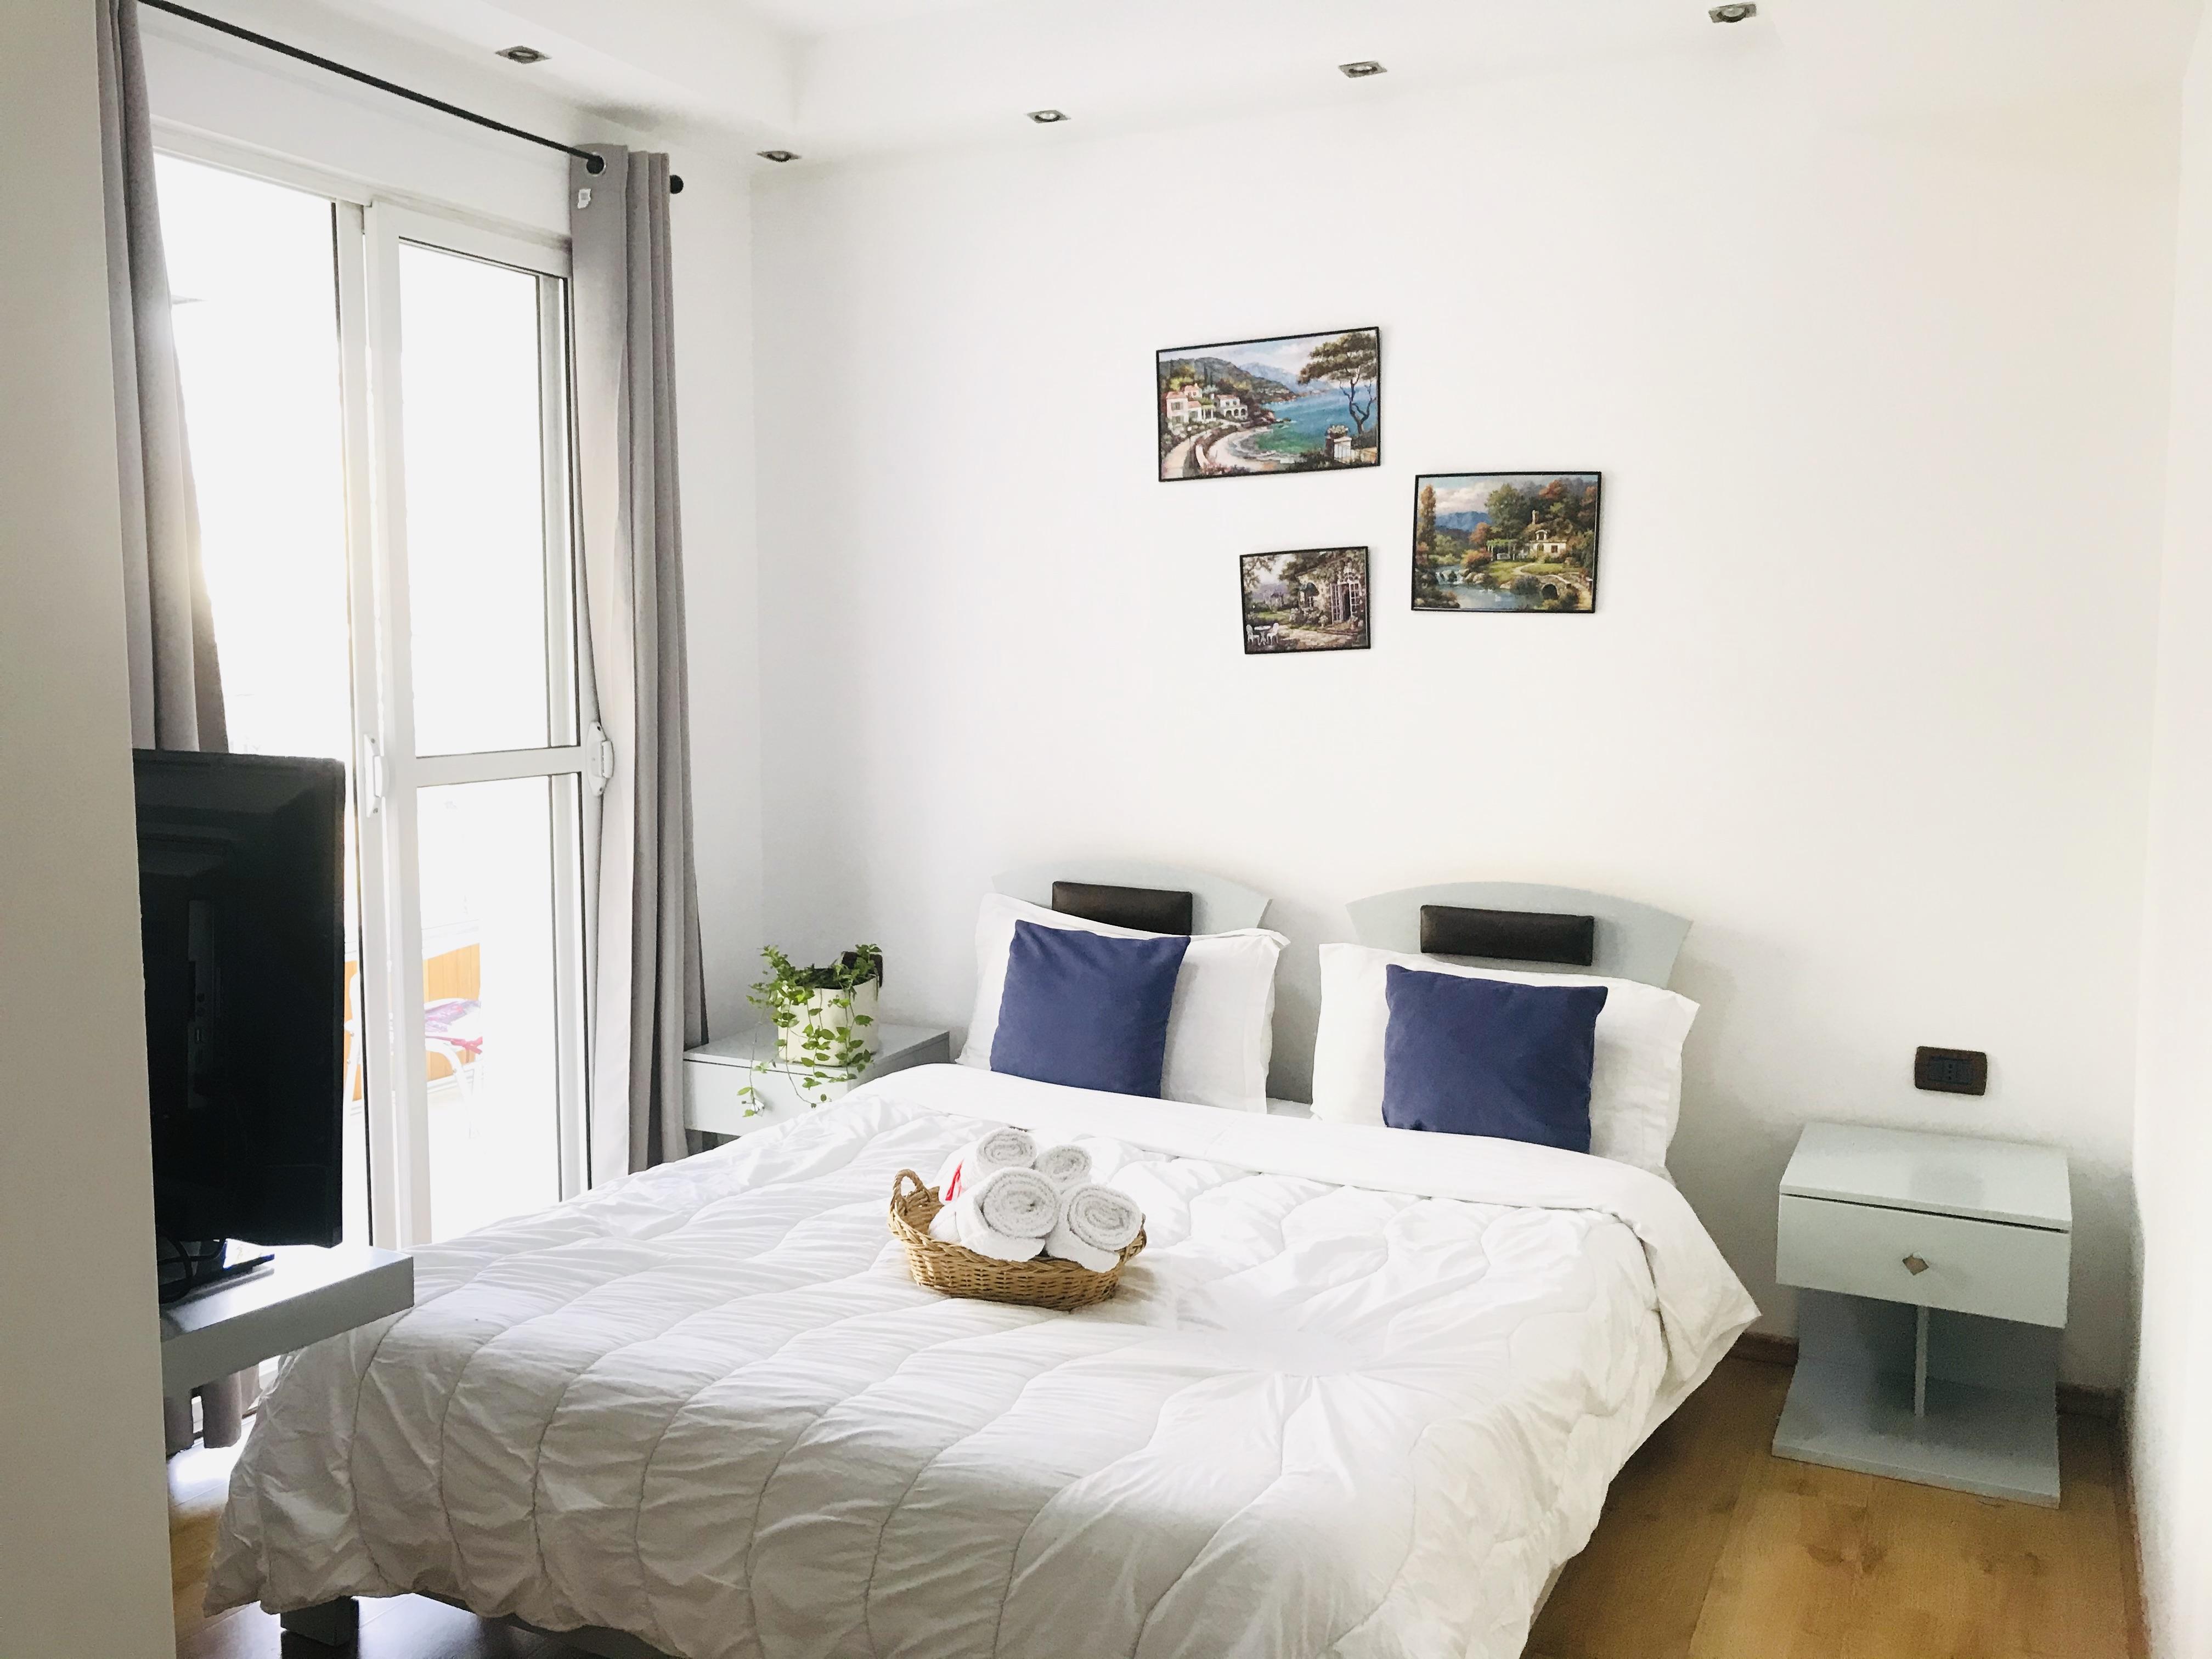 Dhoma me qira ditore prane qendres, Tirane